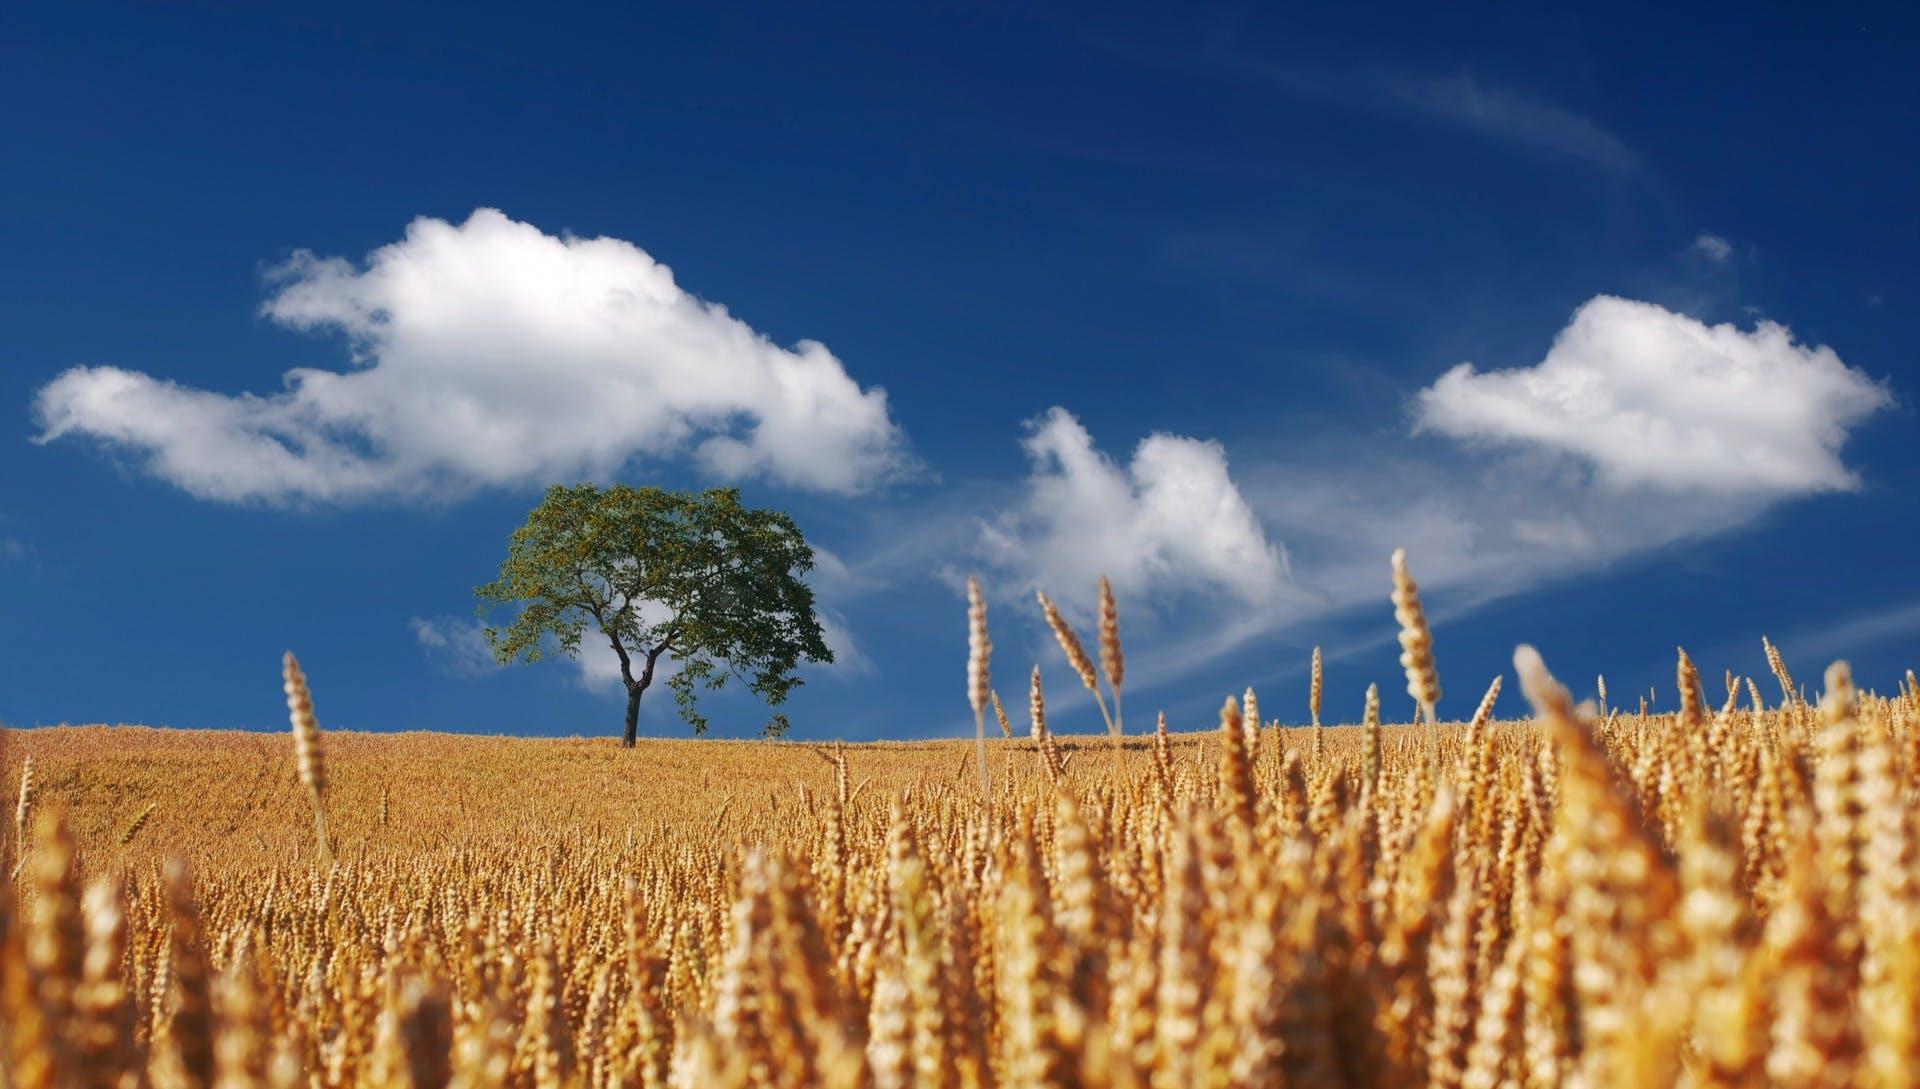 Trees on Yellow Wheat Field Under Blue Sky